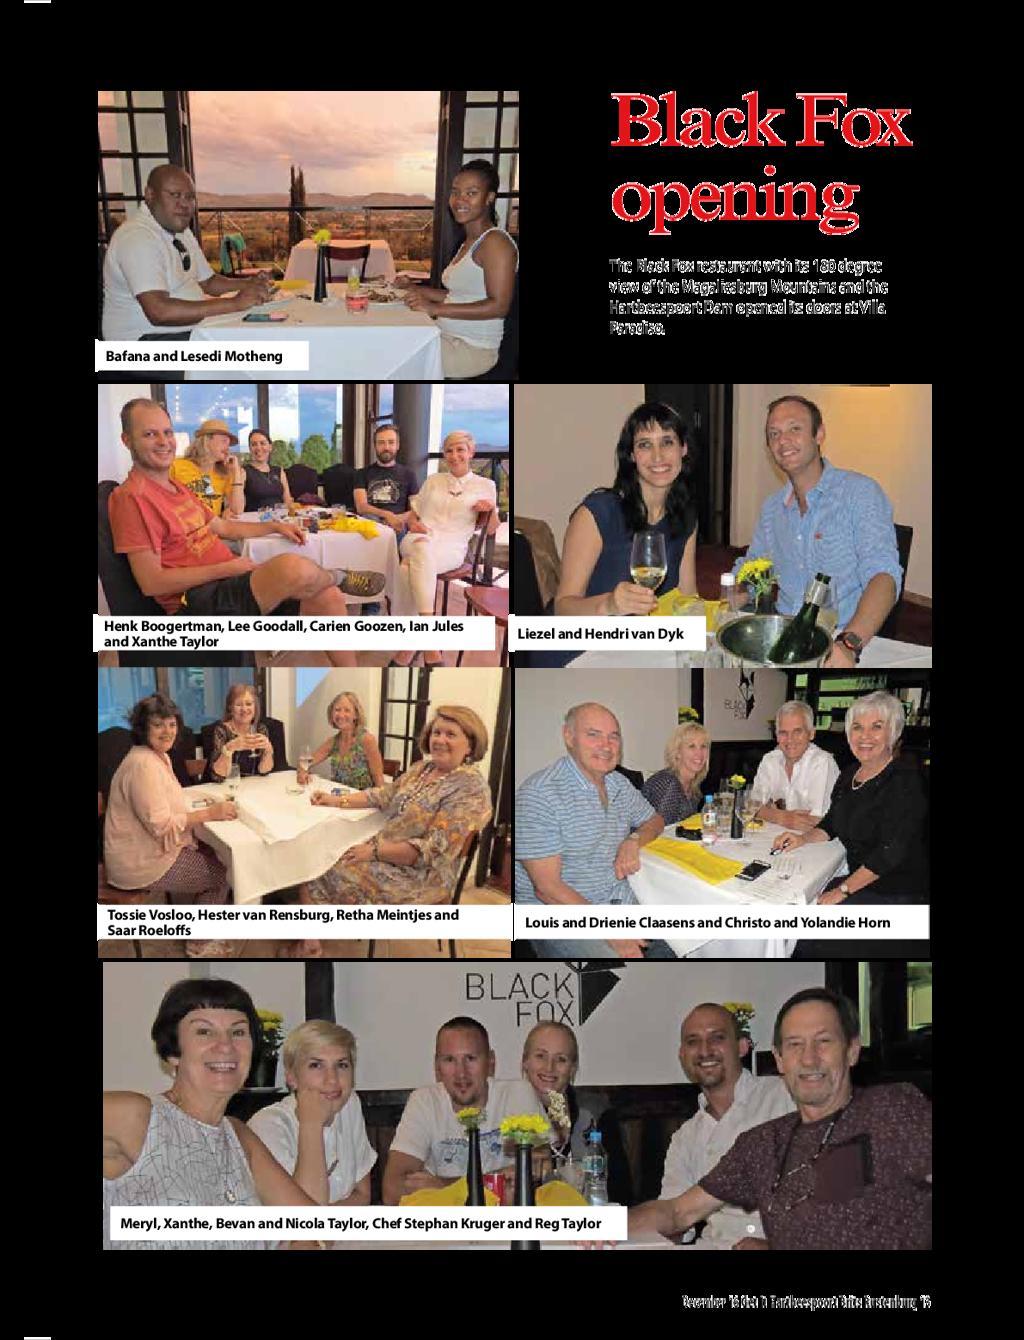 get-it-hartbeespoort-december-2016-epapers-page-15